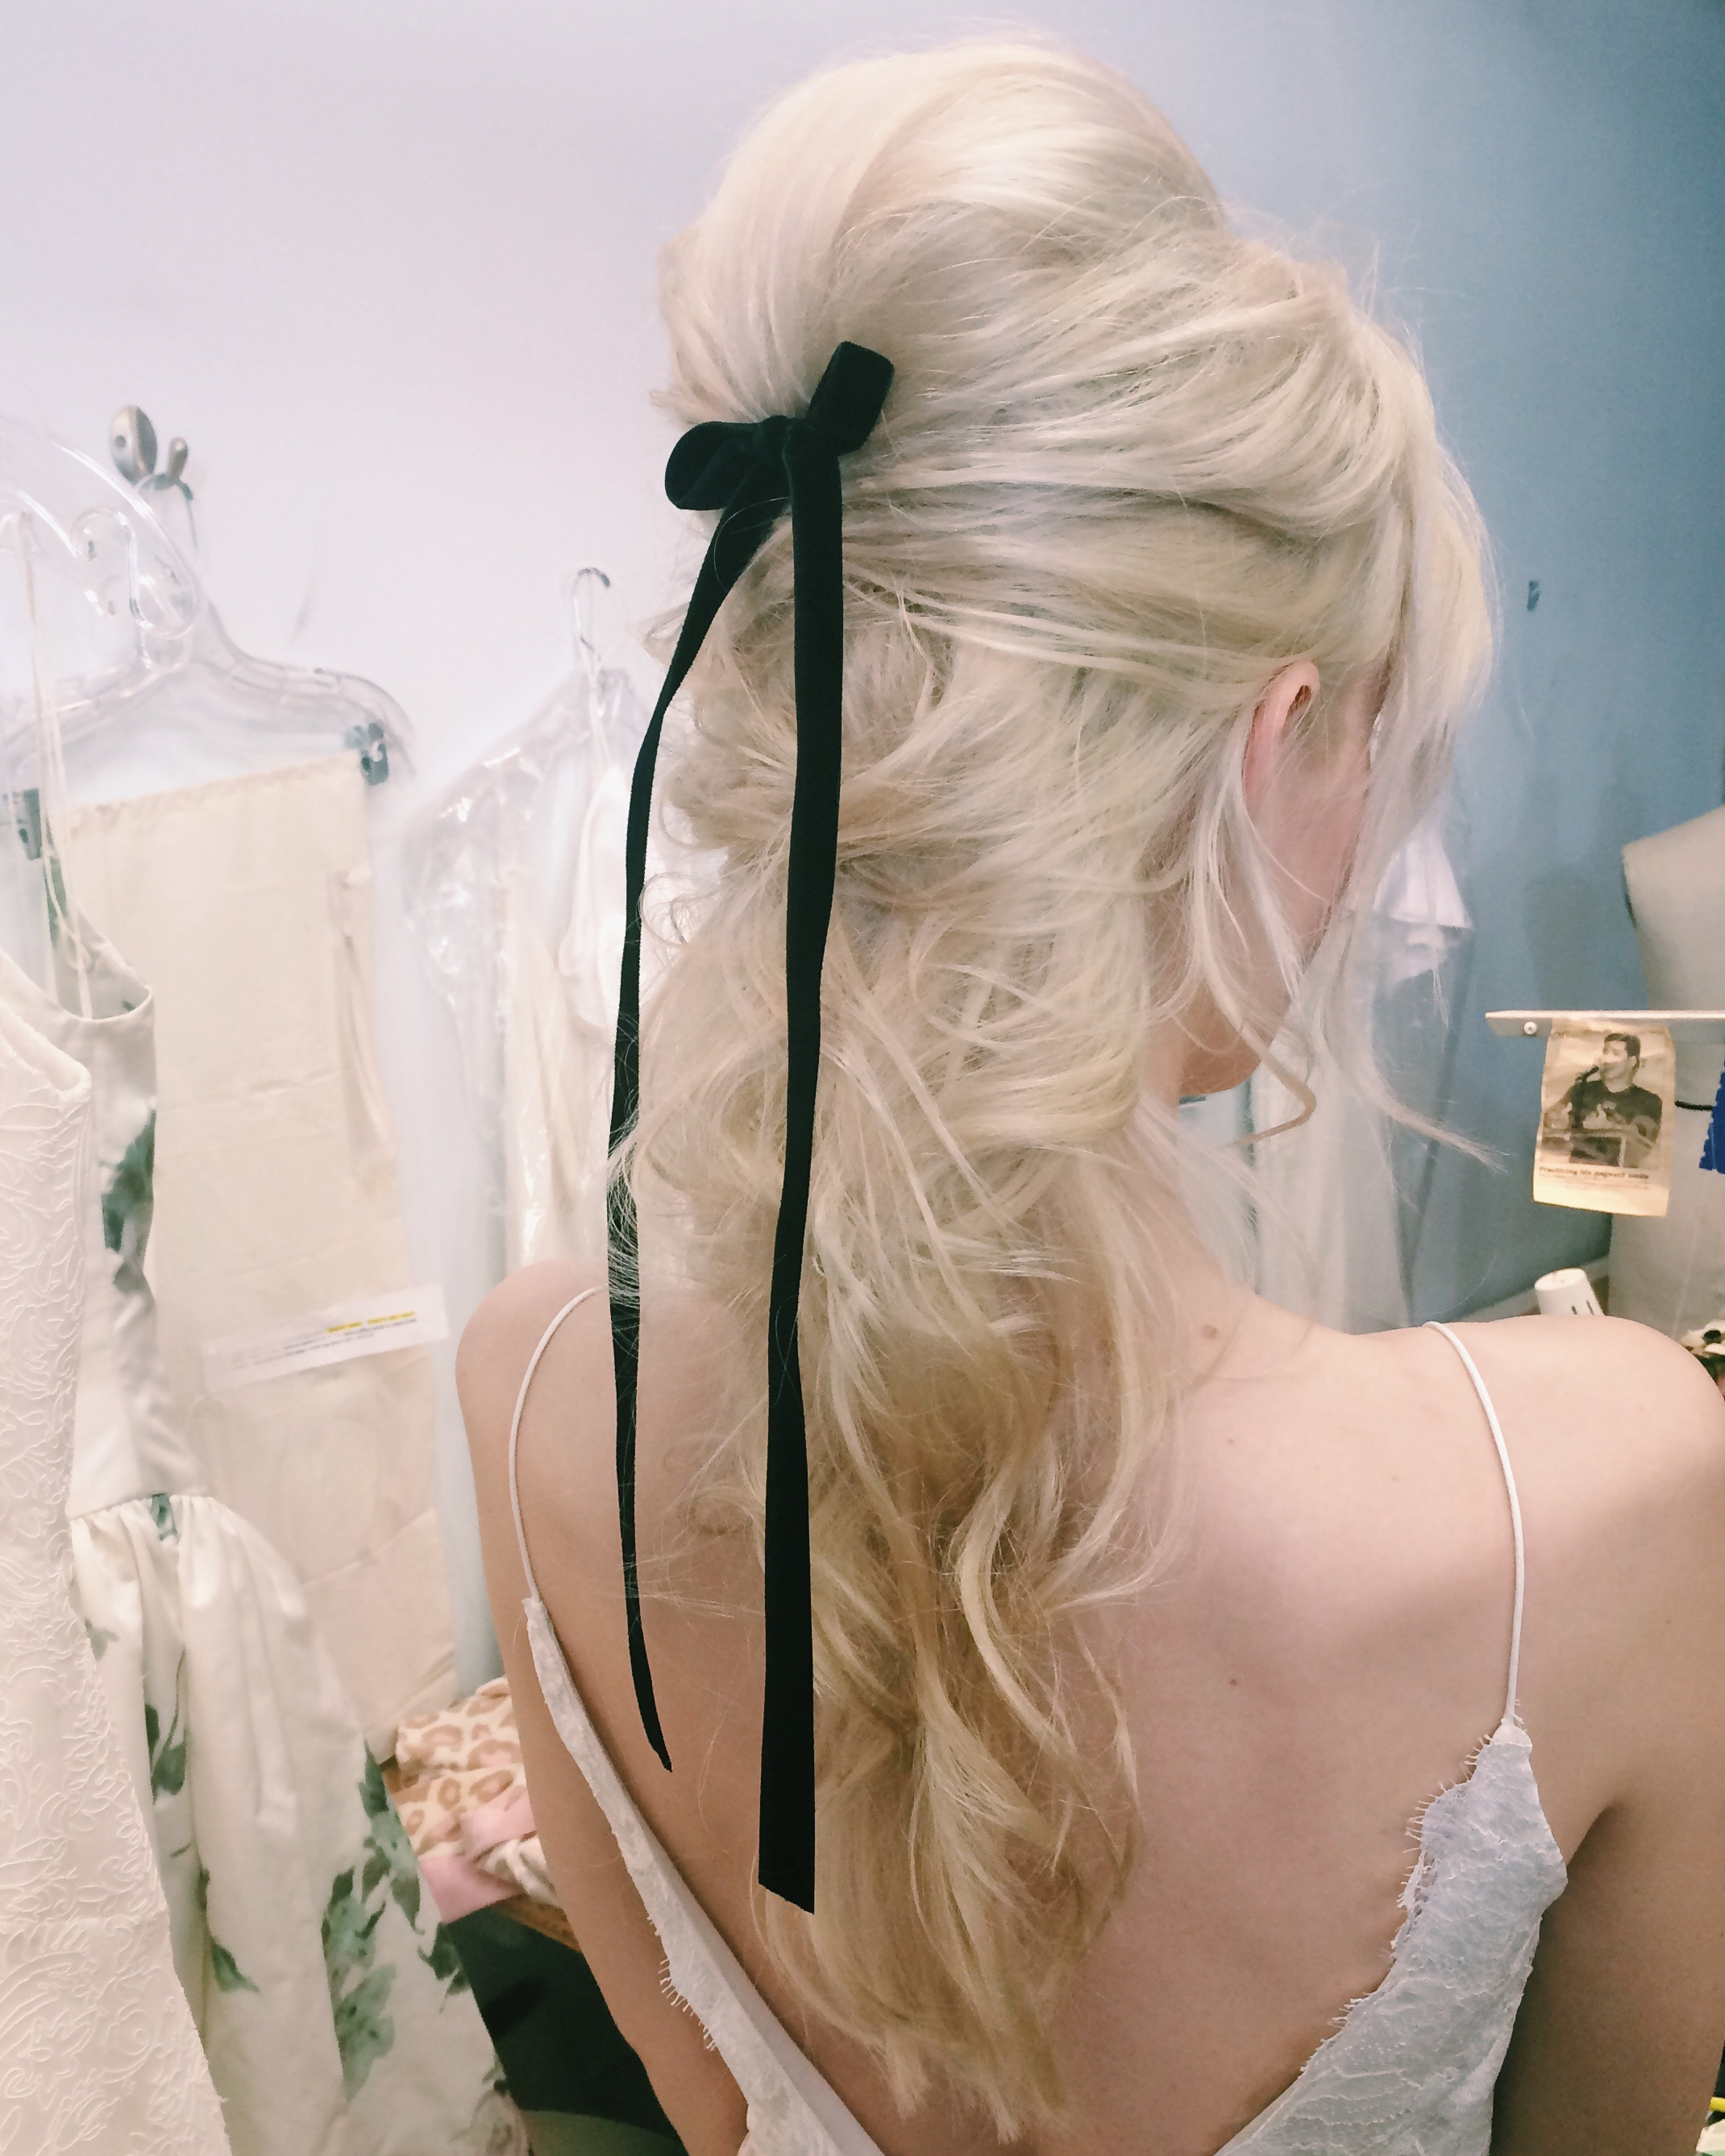 bridal-hair-adornments-spring2016-elizabeth-fillmore-0415.jpg